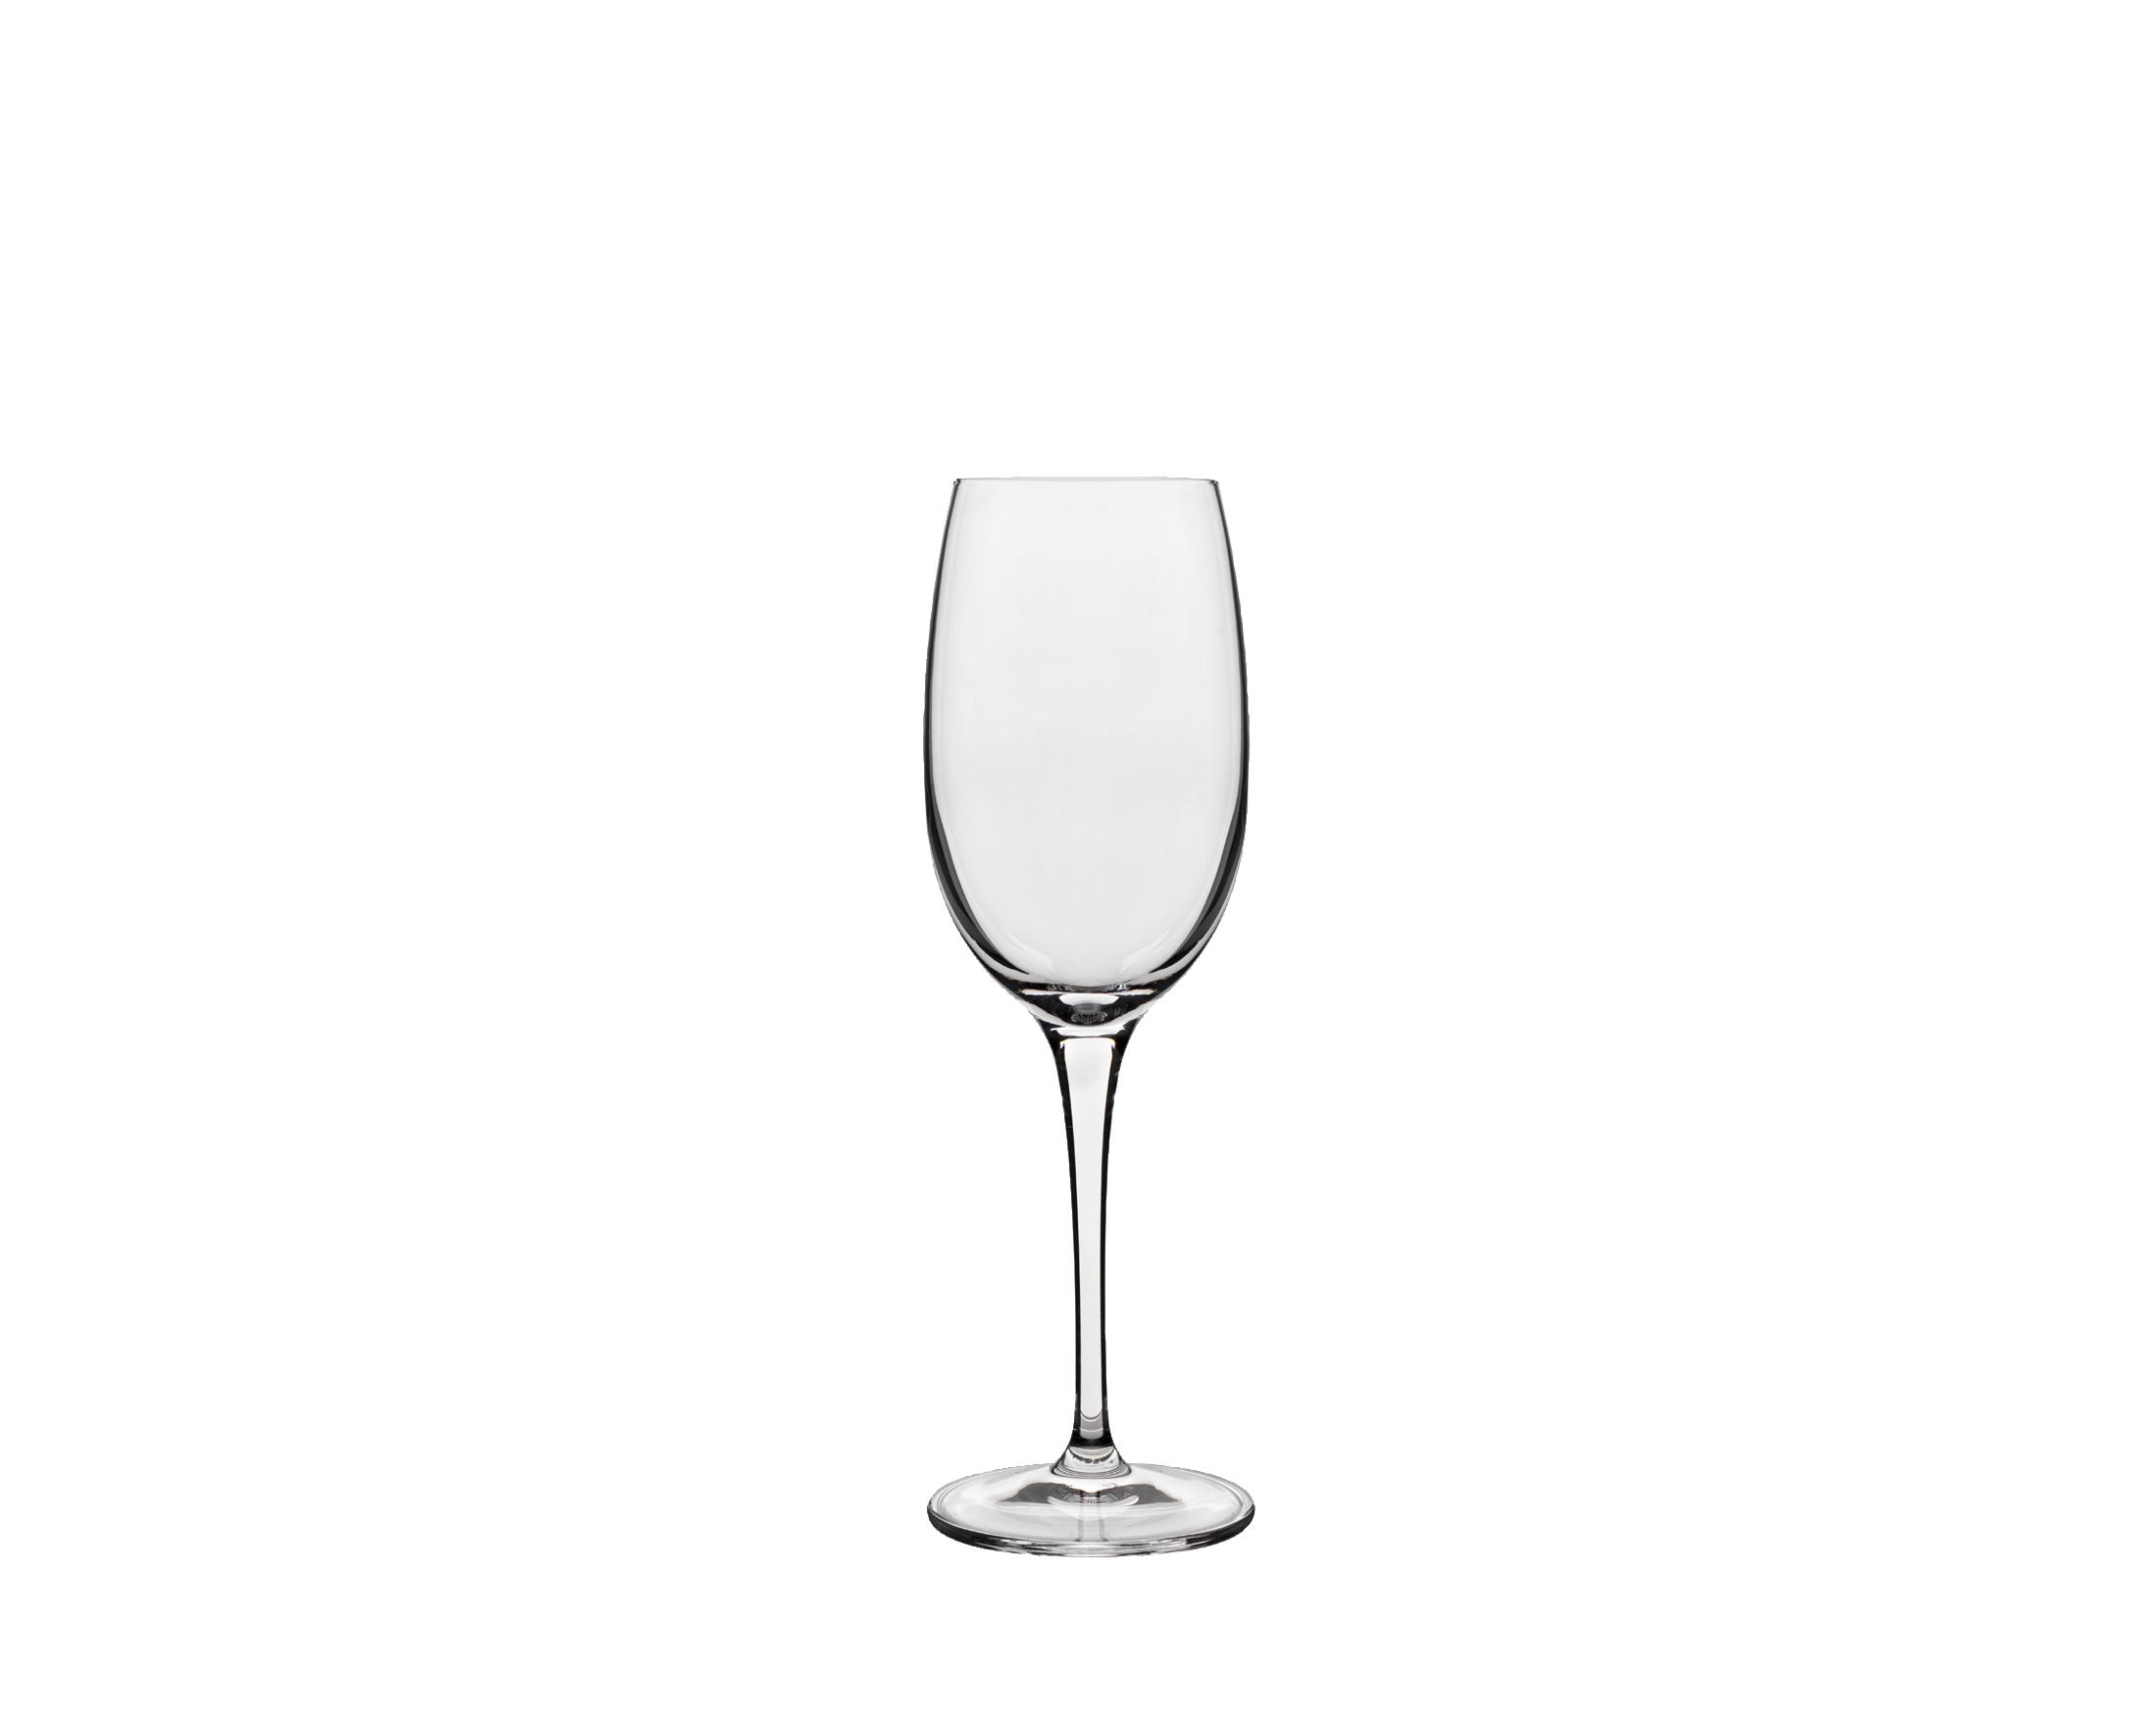 Luigi Bormioli Vinoteque portsvinsglas, 120 ml, 6 stk